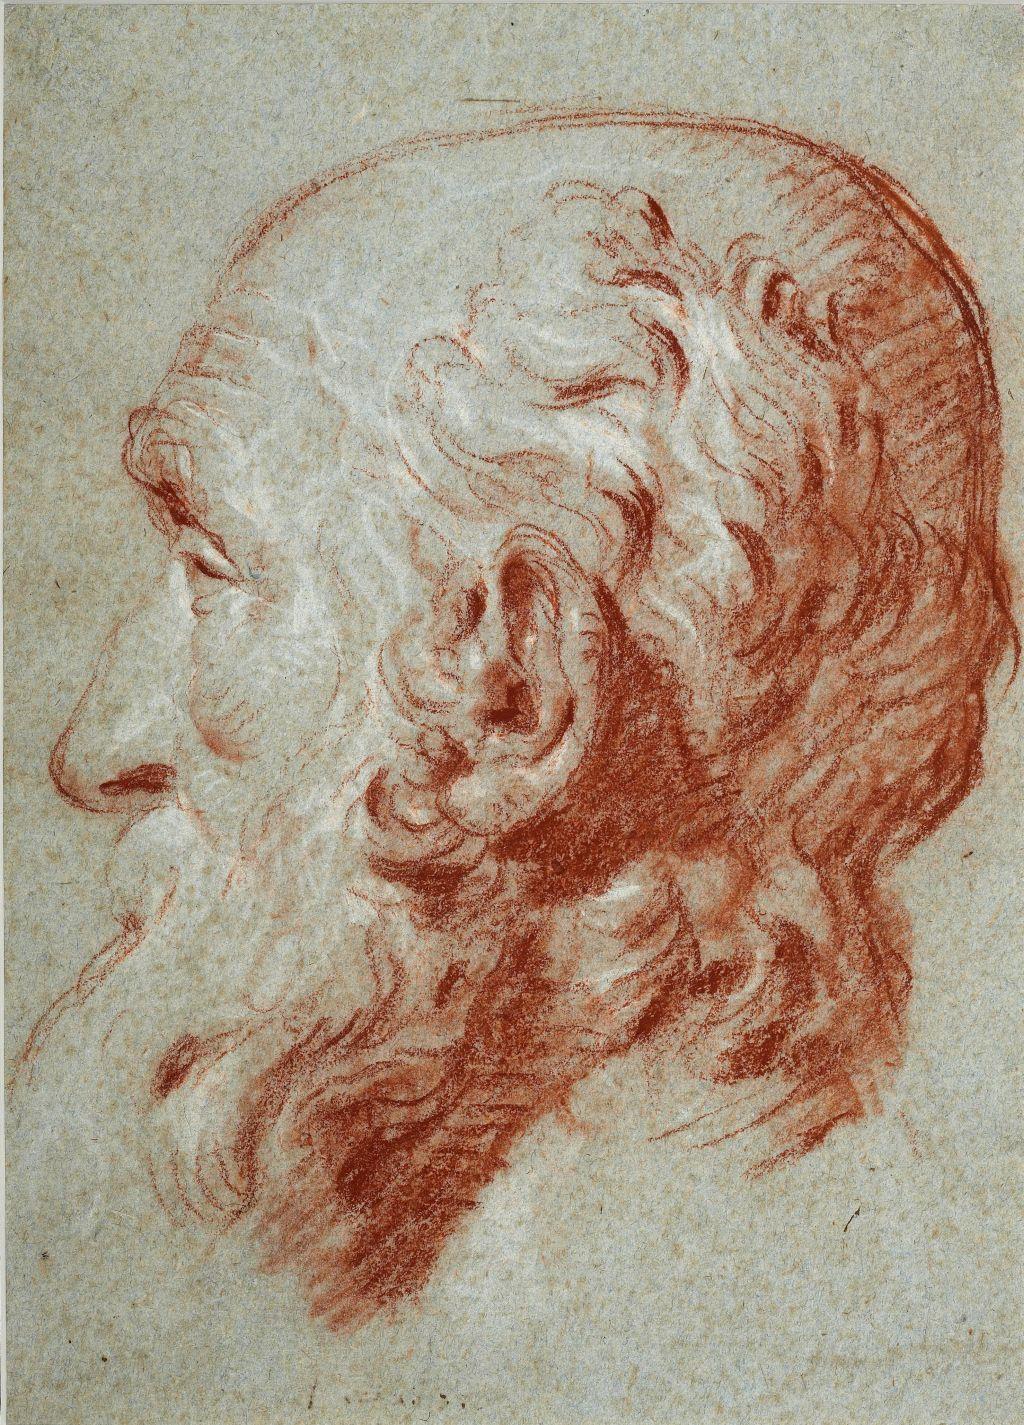 Cabeza de Giulio Contarini, después de Alessandro Vittoria, Giovanni Battista Tiepolo